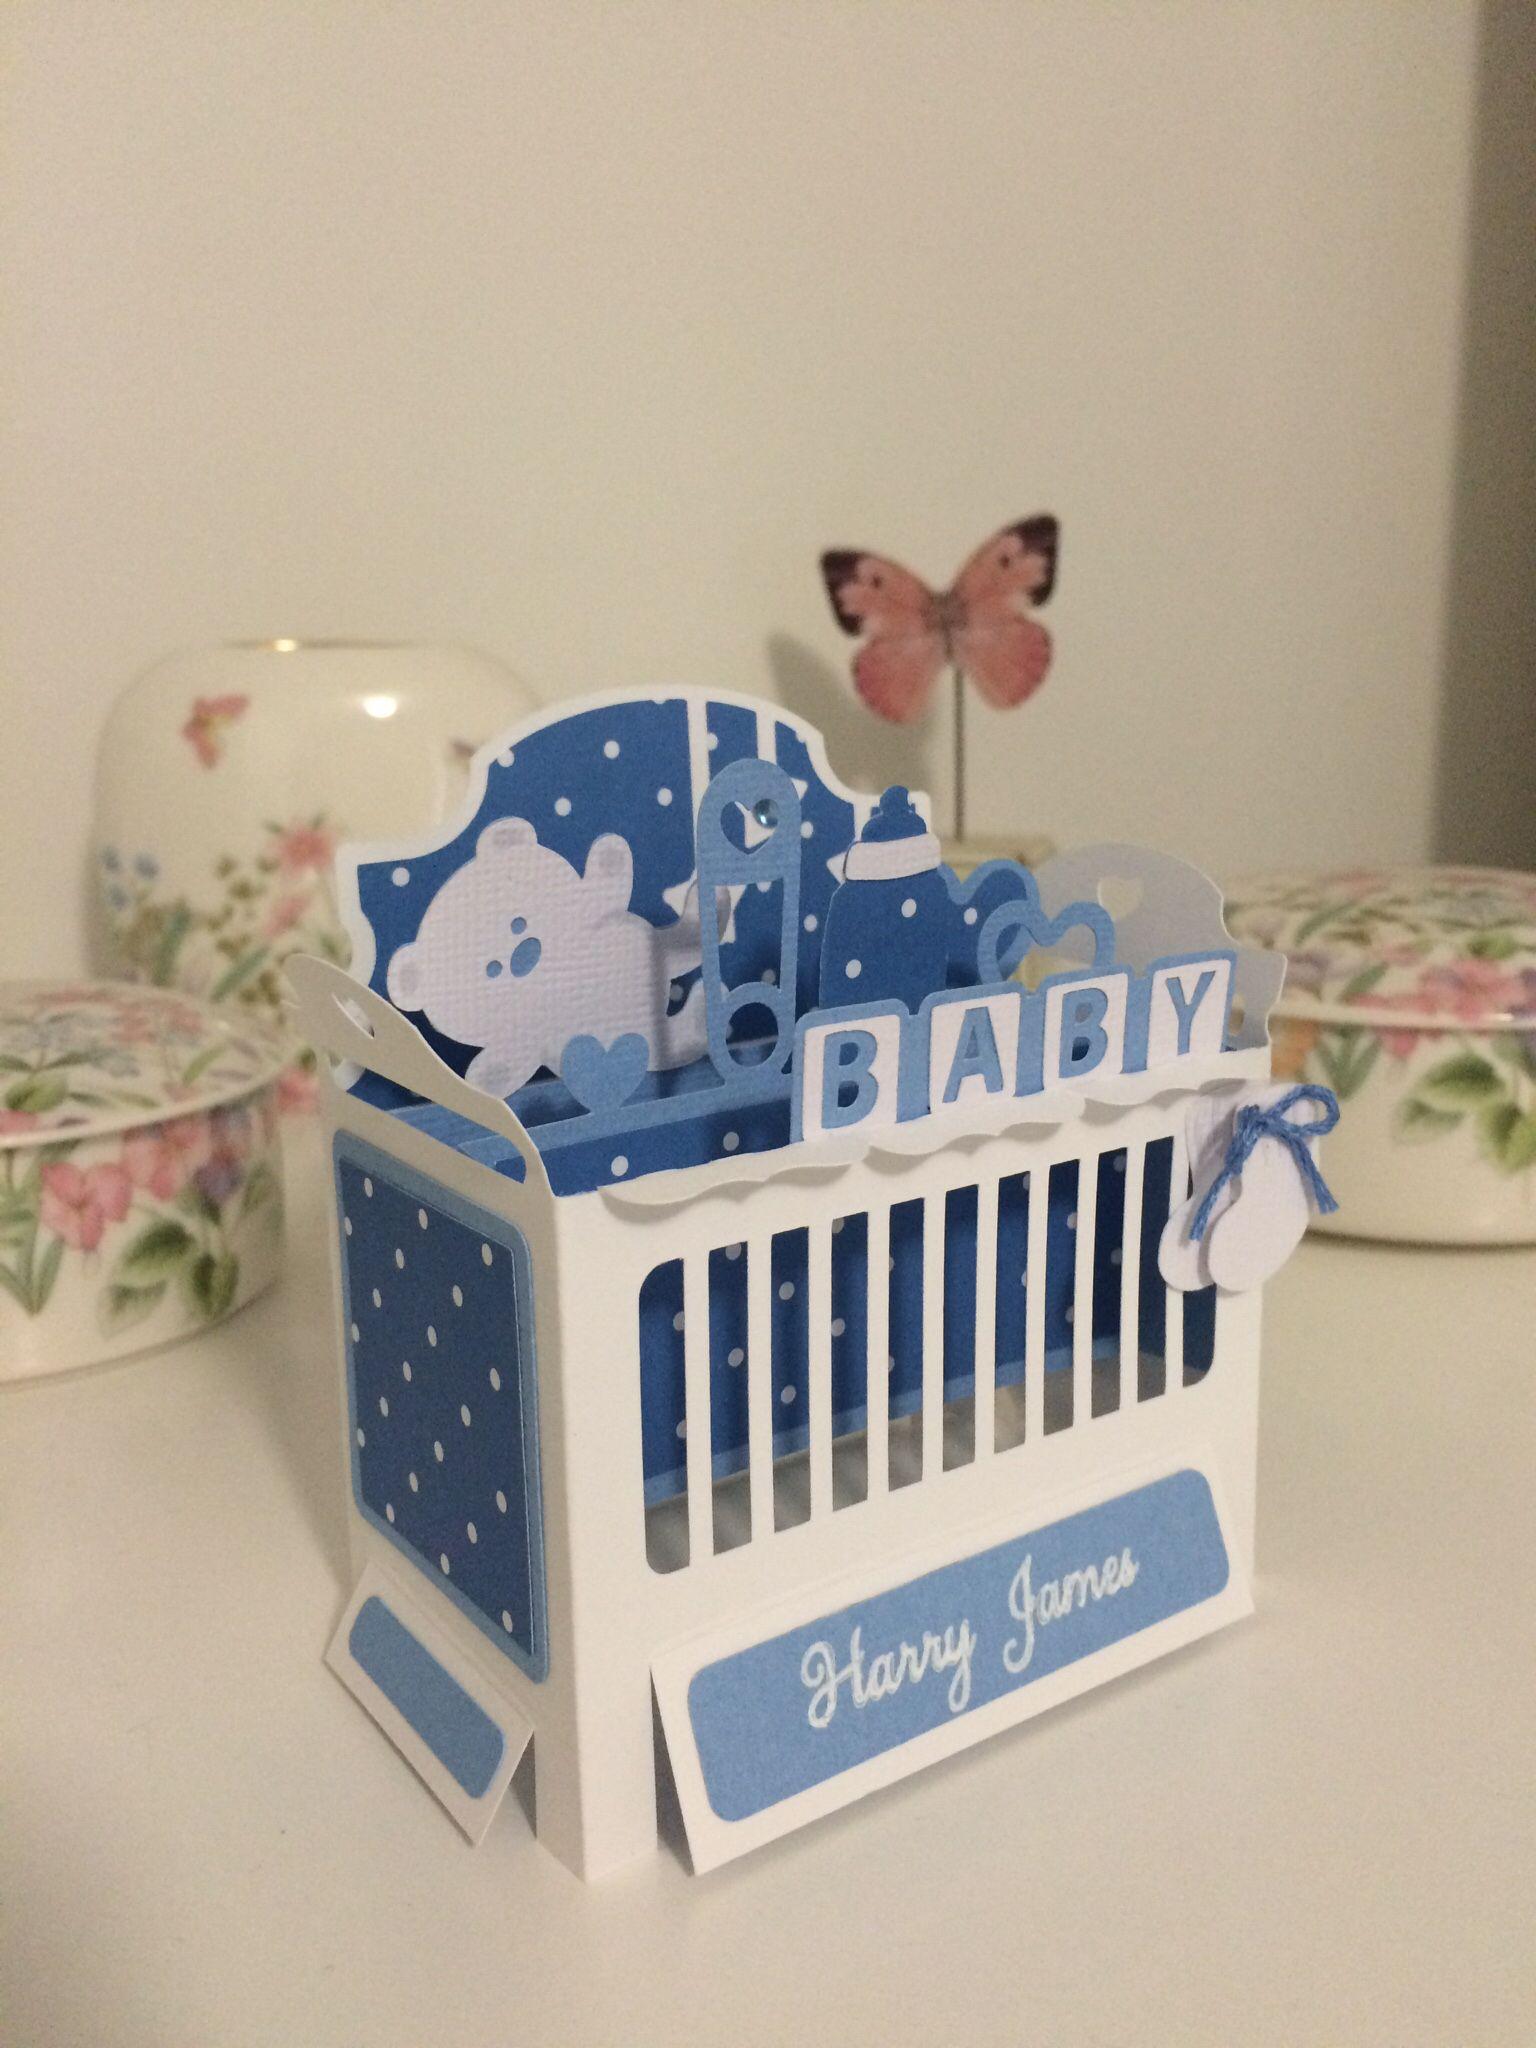 Baby cribs hamilton ontario - Baby Crib Cot Box Card Pattern From Svg Cuts